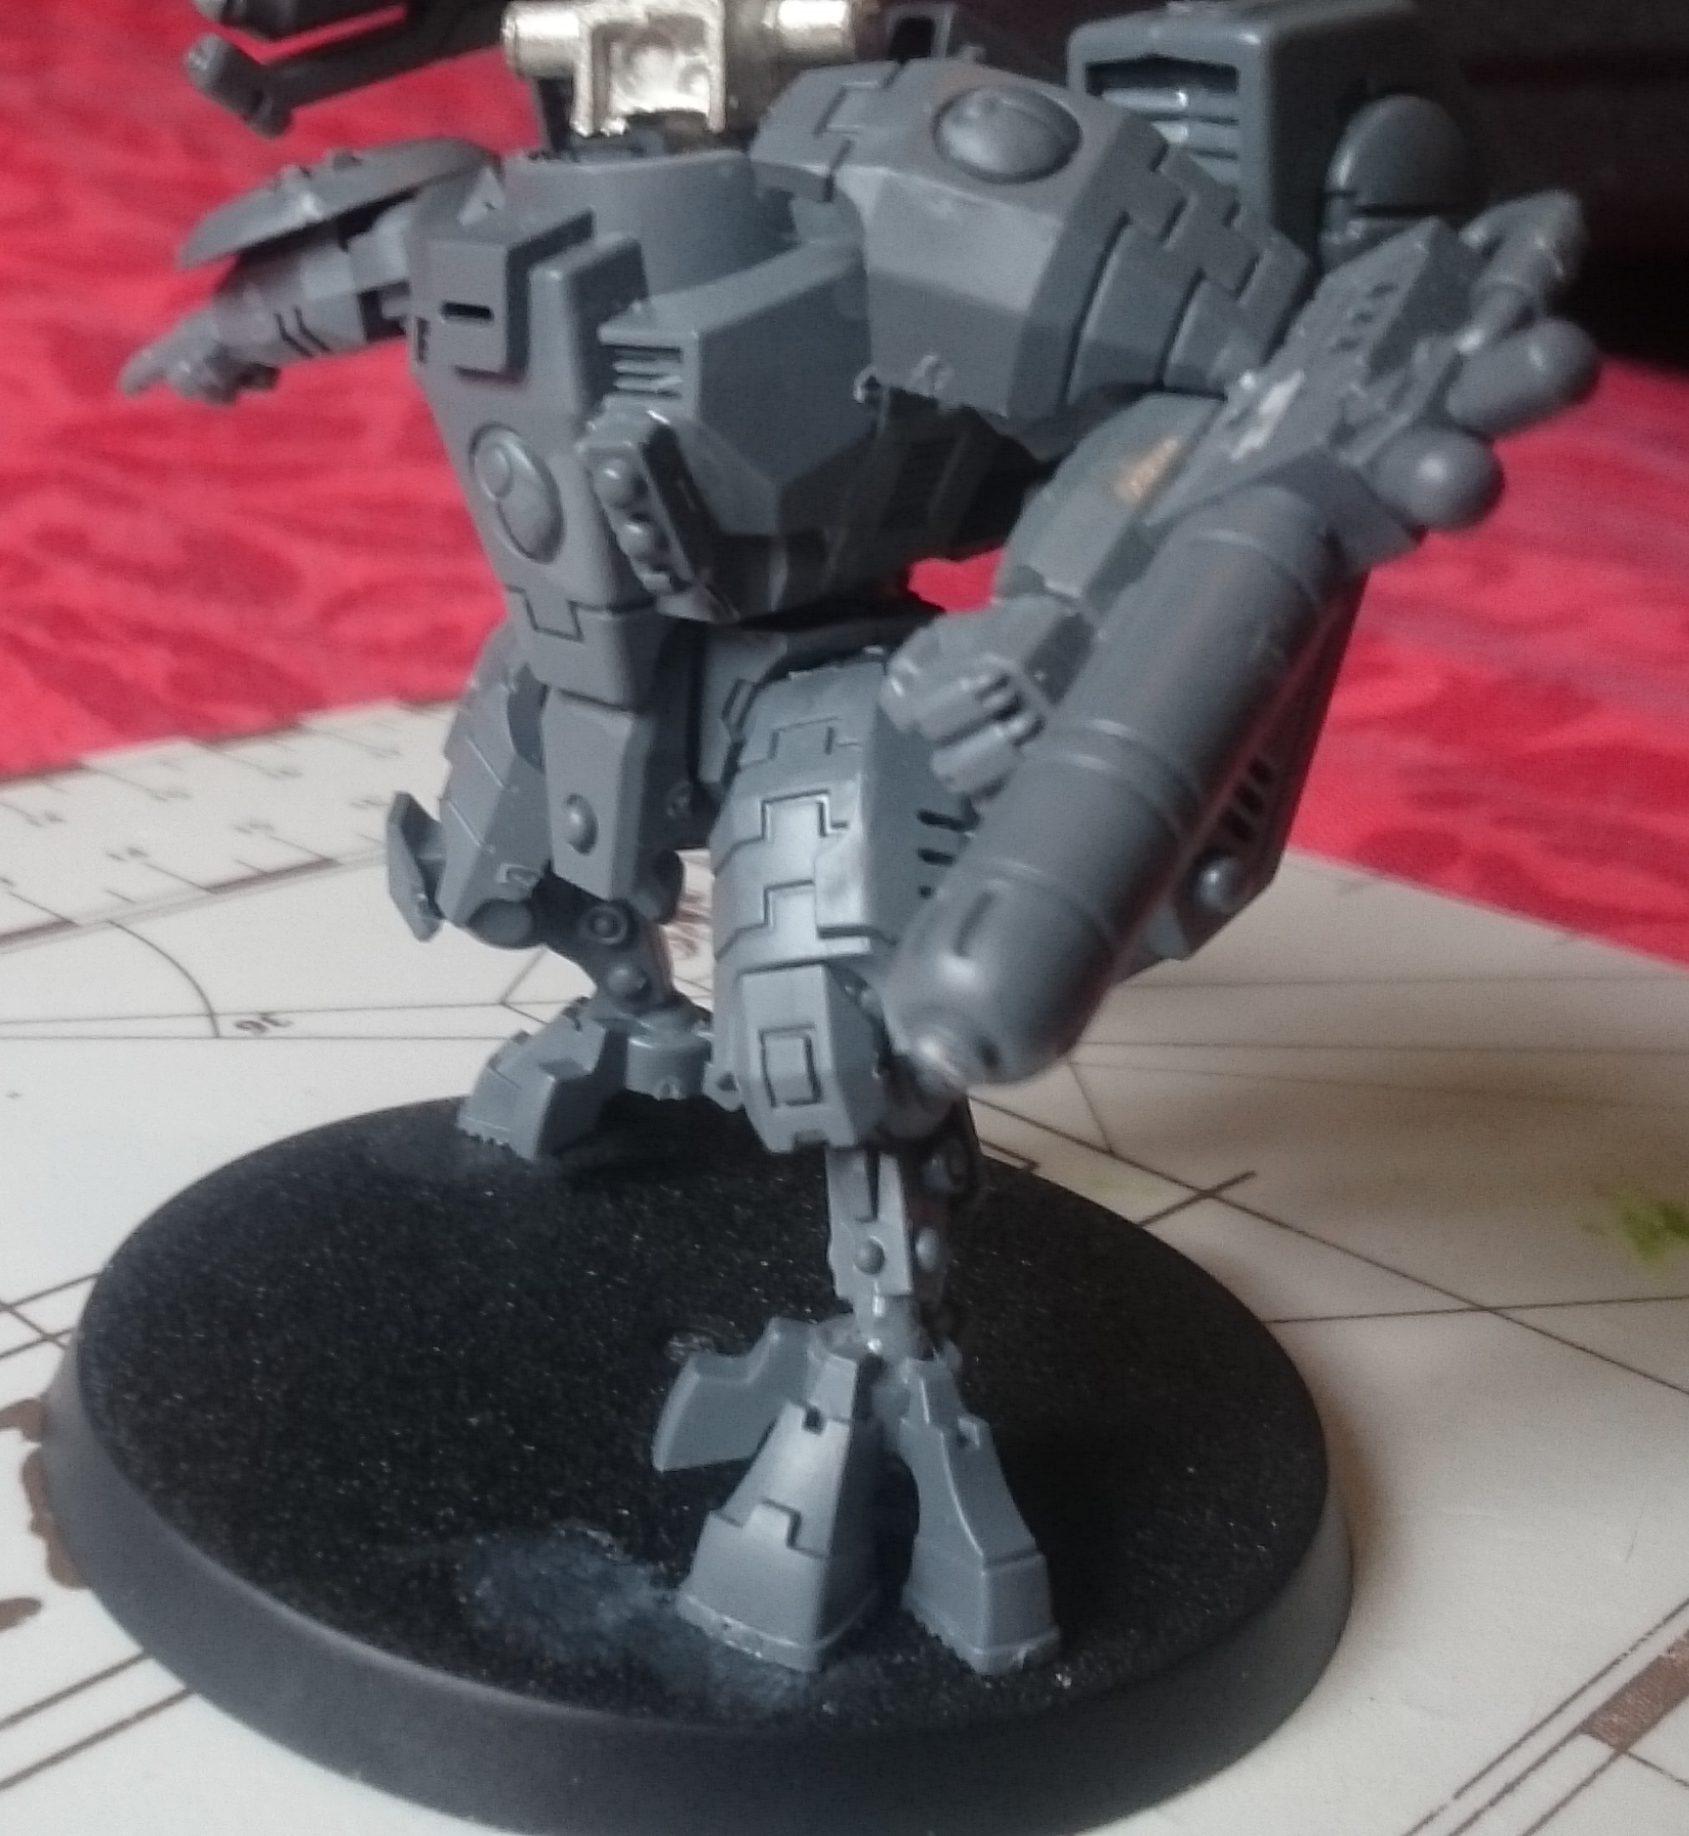 Commander Bravestorm